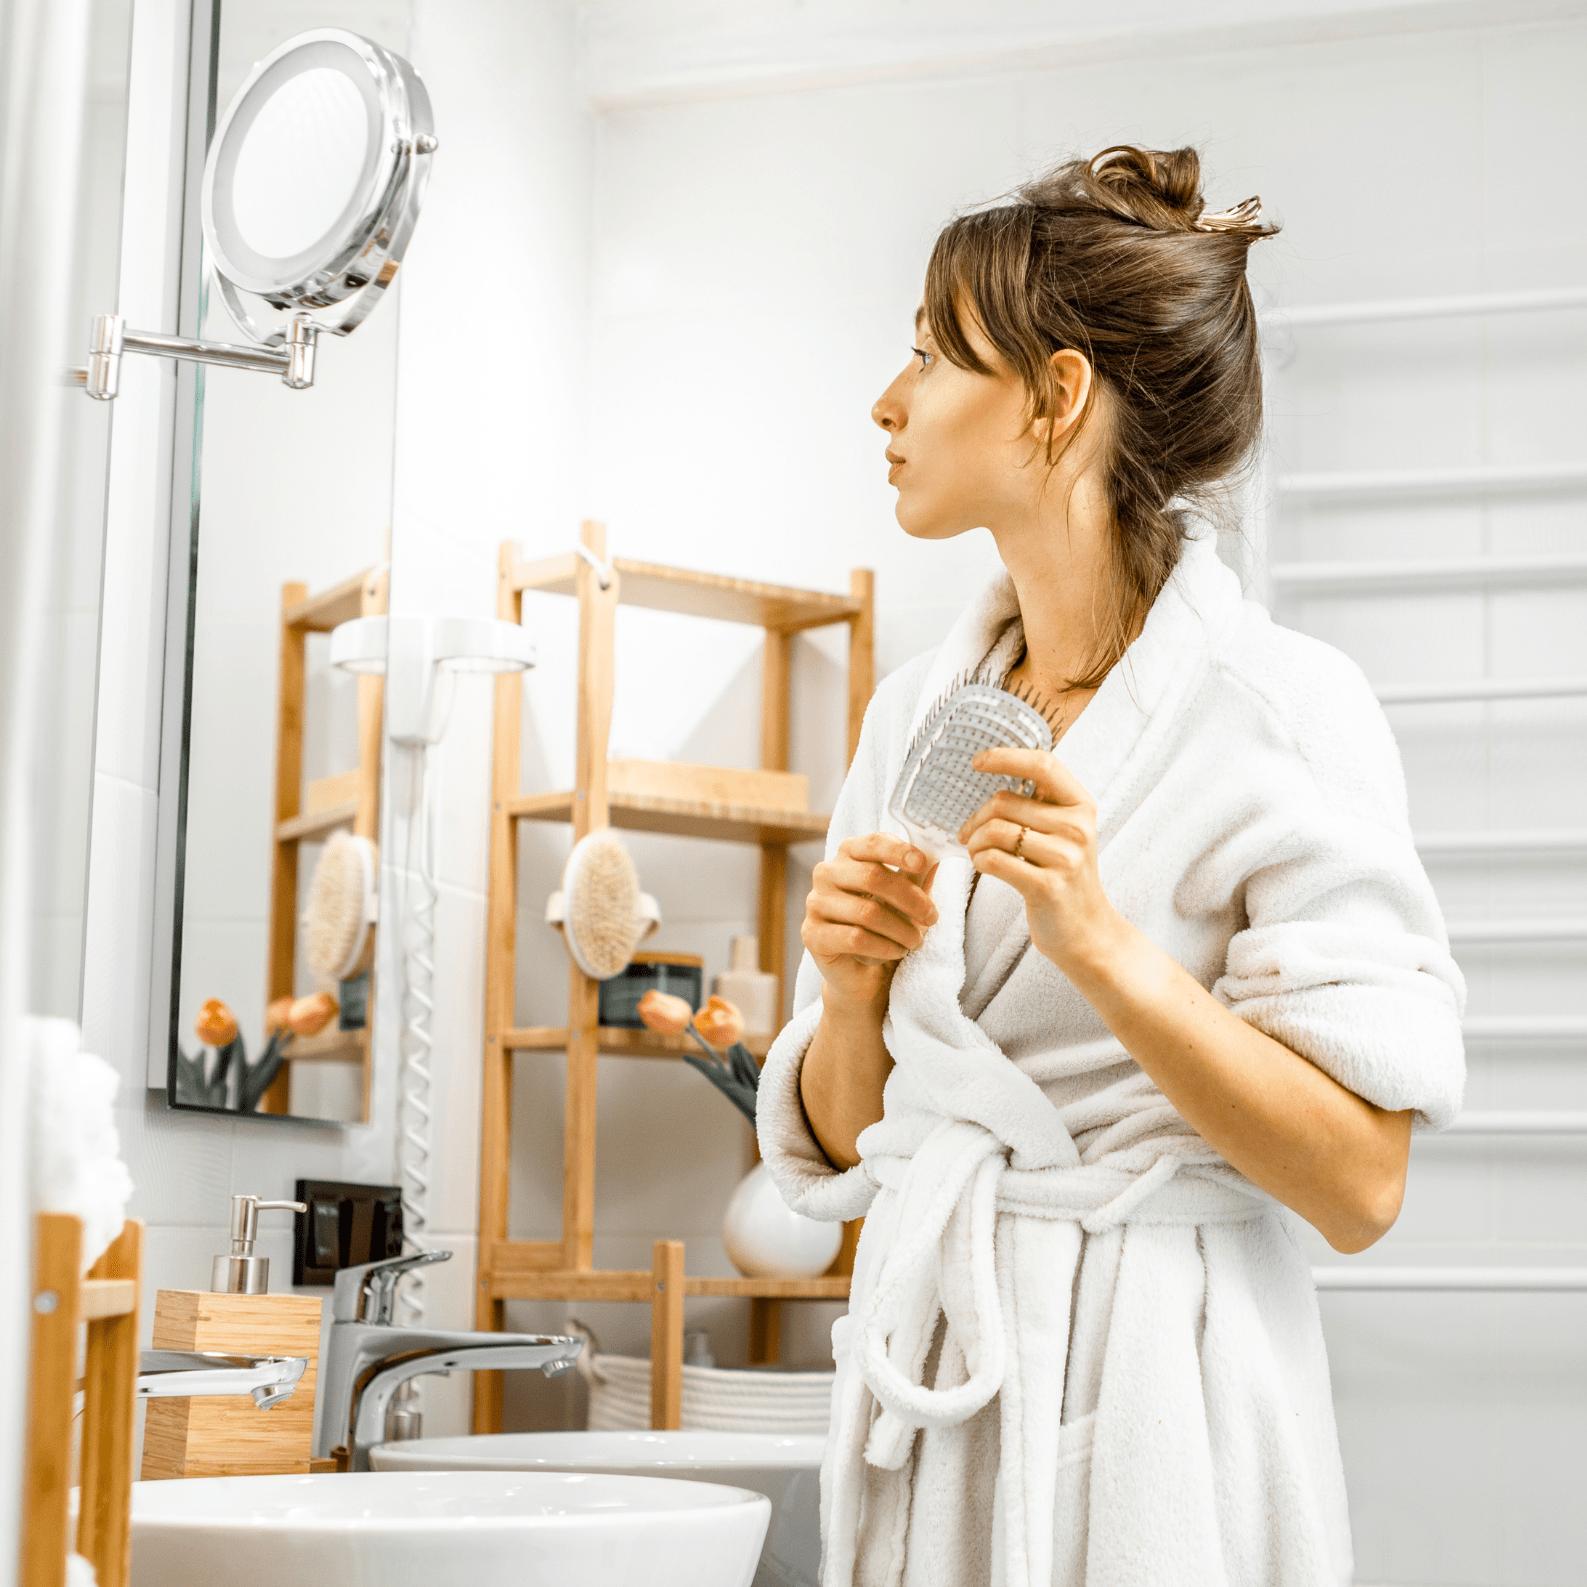 beauté hygiène féminine zéro déchet